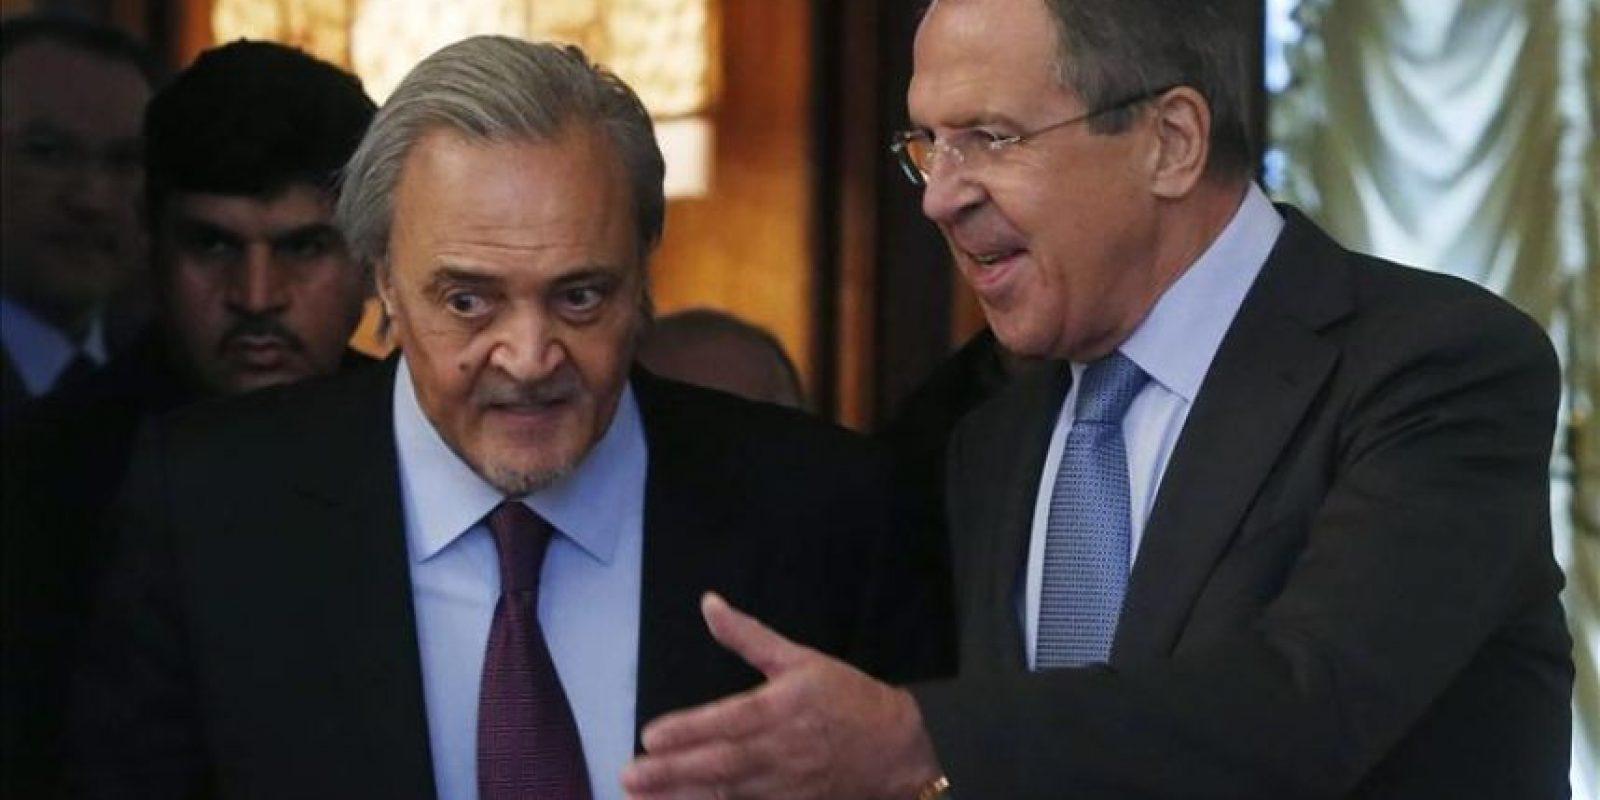 El ministro de Exteriores ruso, Serguéi Lavrov (dcha), recibe hoy a su homólogo saudí, Saud al Faisal, antes de una reunión en Moscú (Rusia). EFE